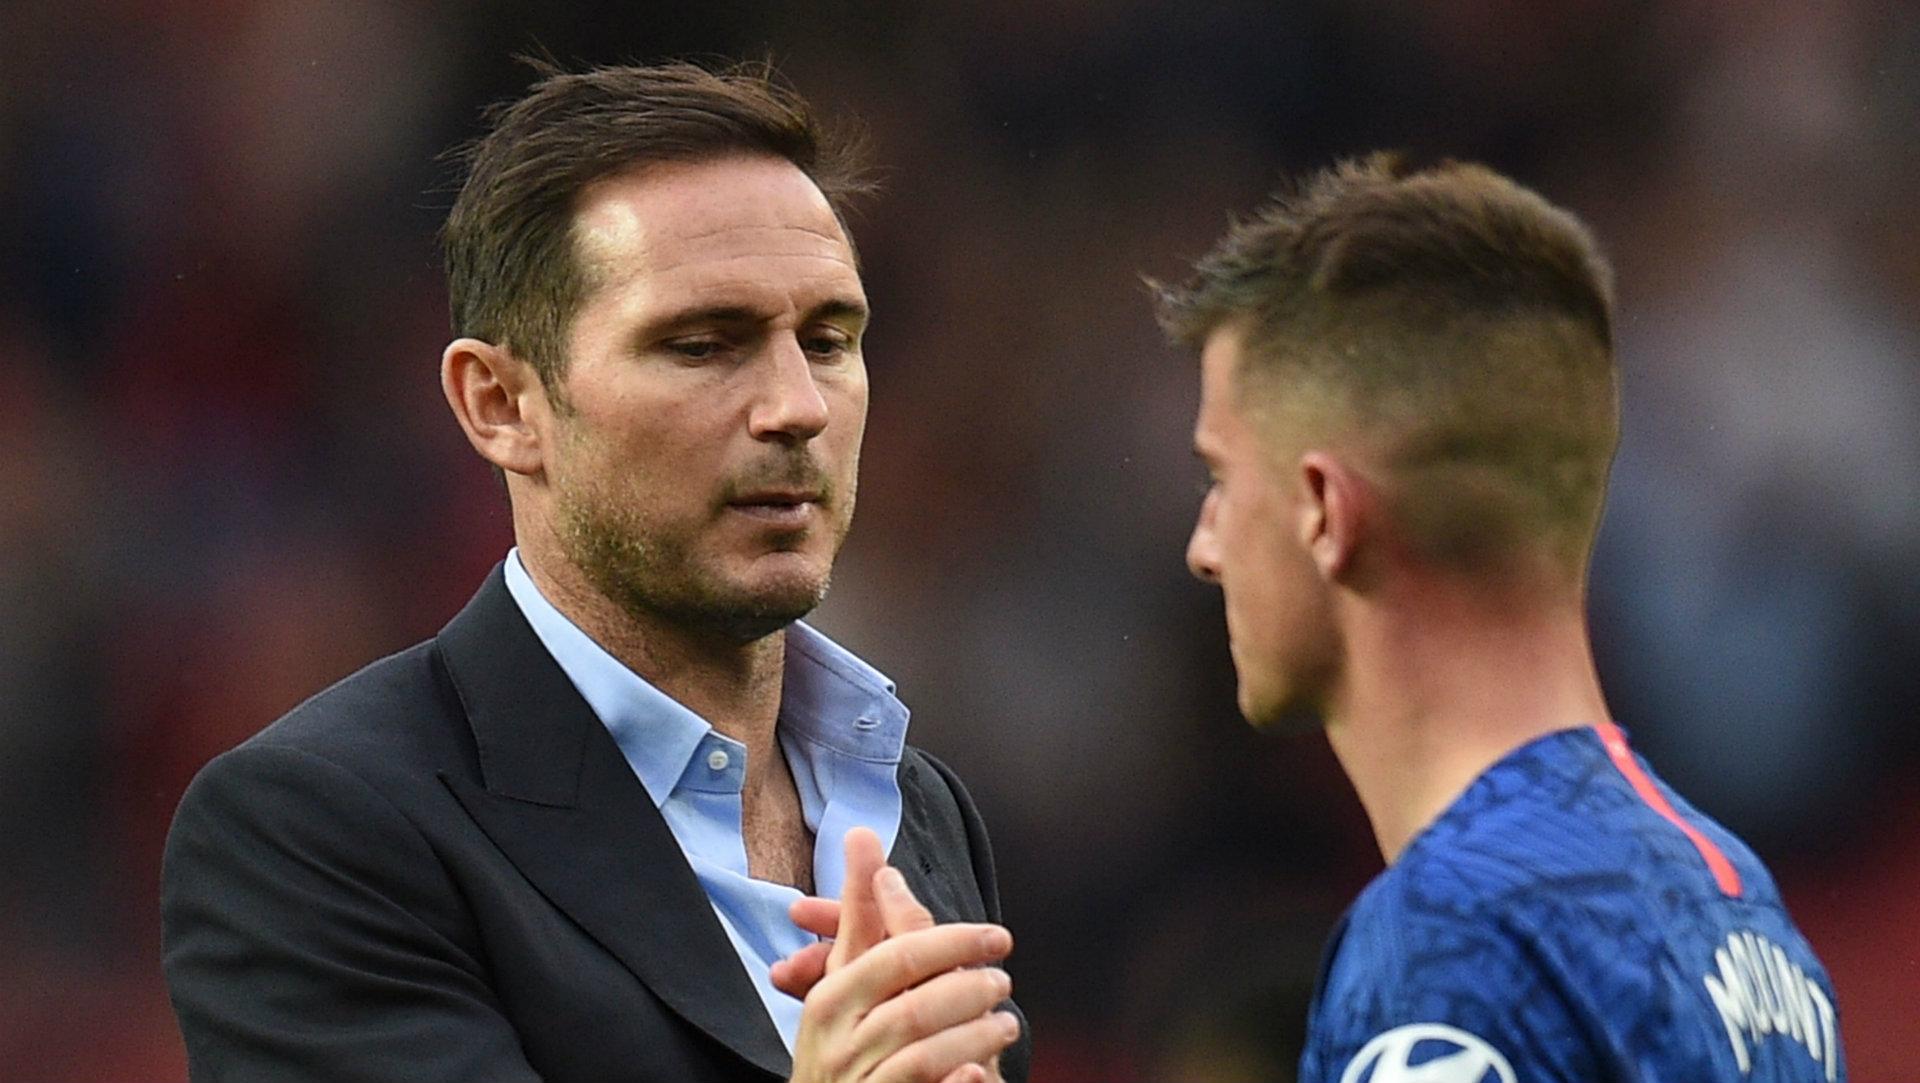 Frank Lampard Mason Mount Manchester United vs Chelsea 2019-20